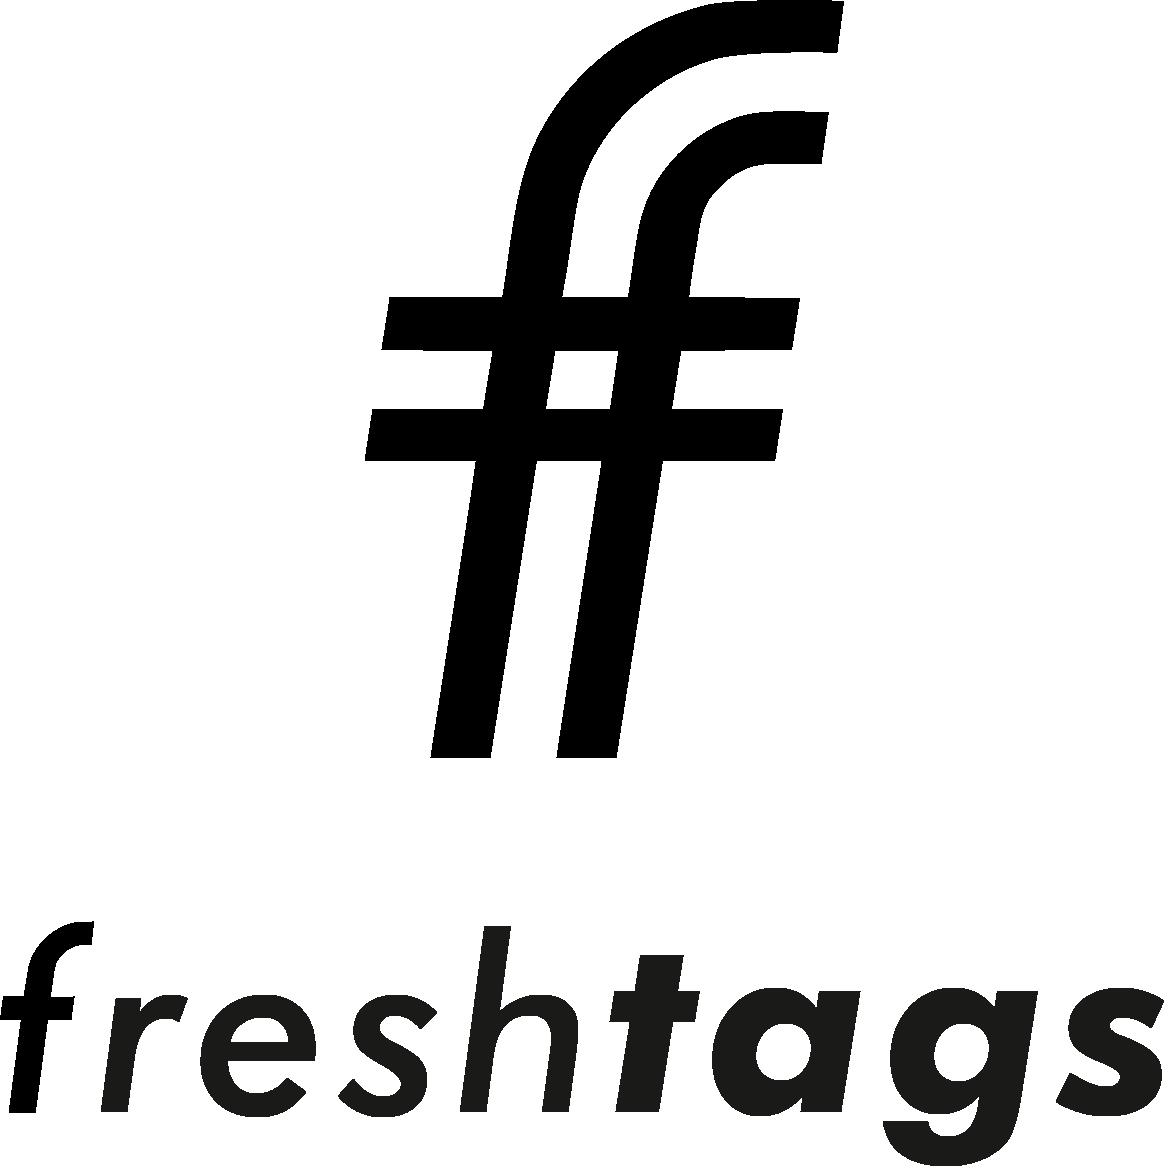 freshtags_logo-png.png